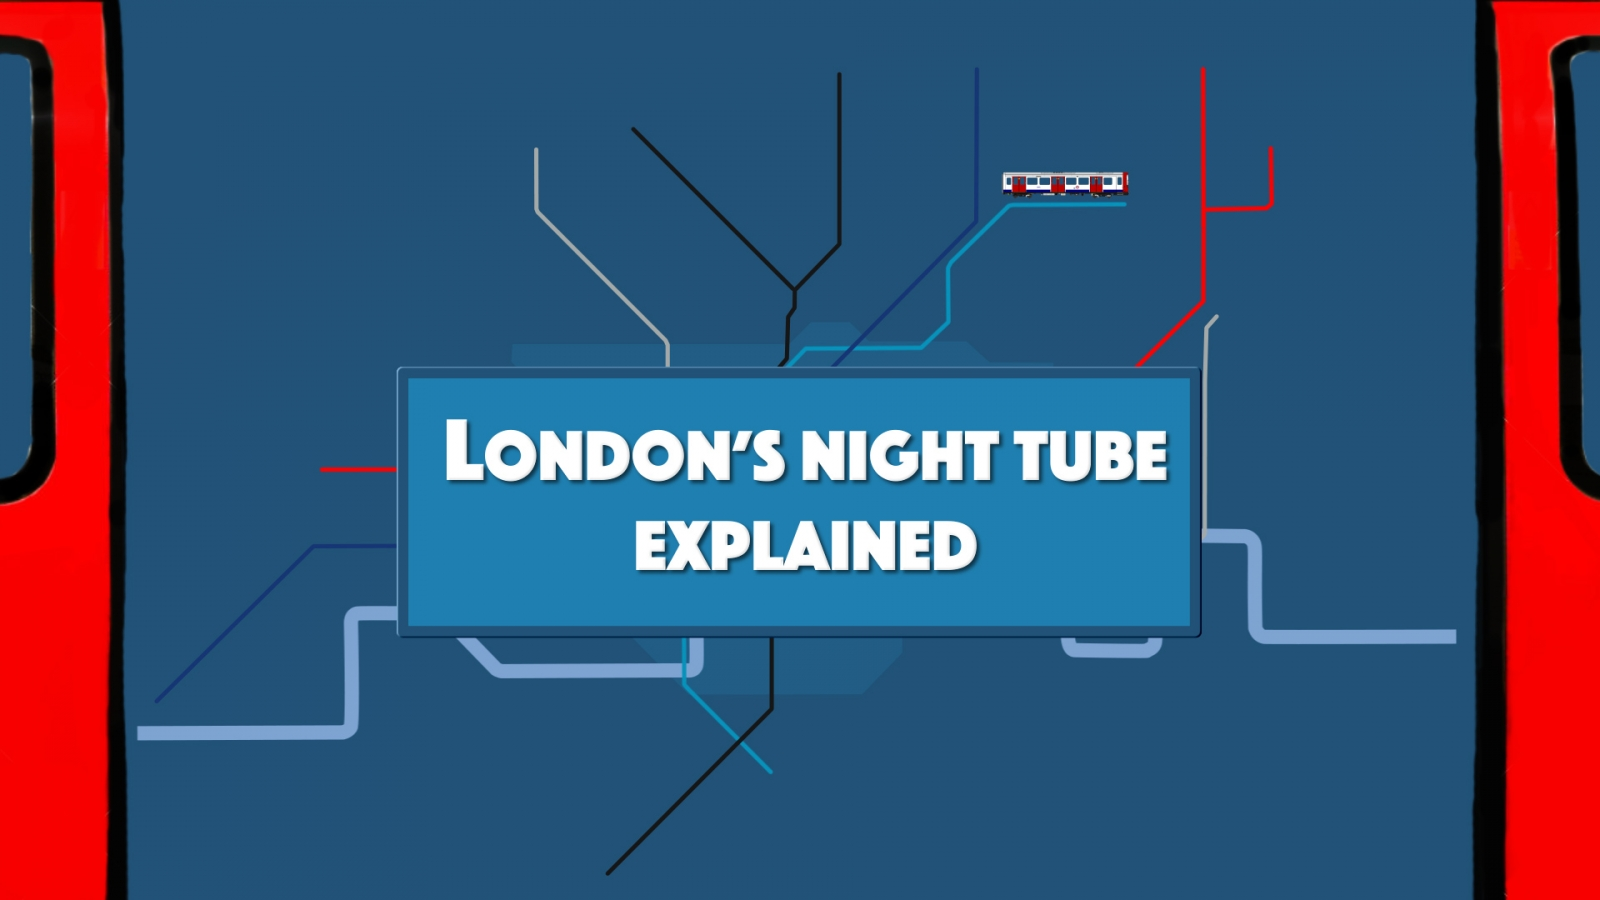 London's night tube explained